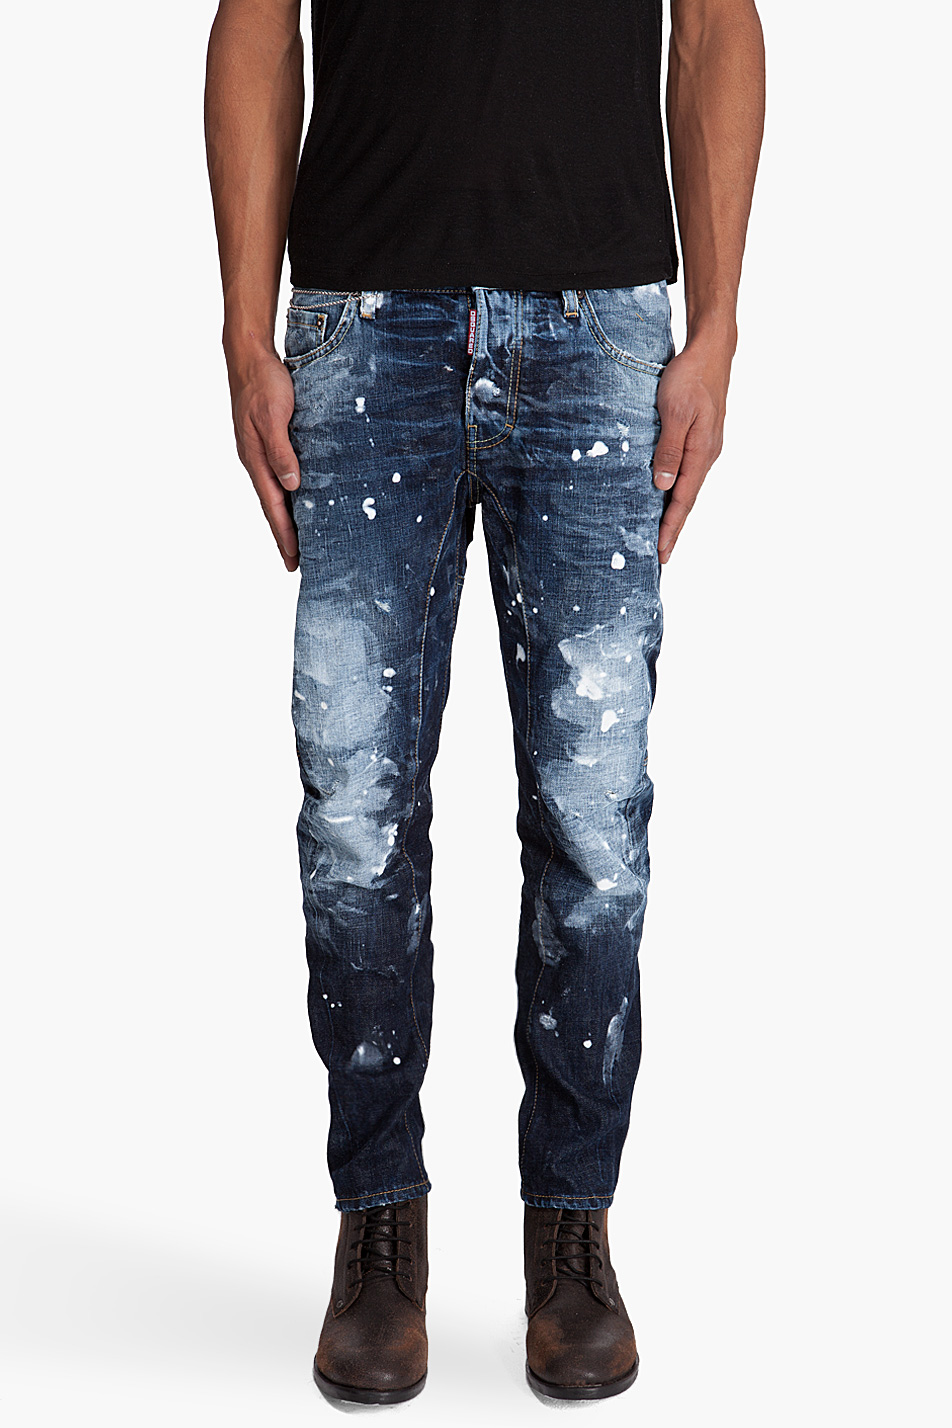 Mens Loose Fit Jeans